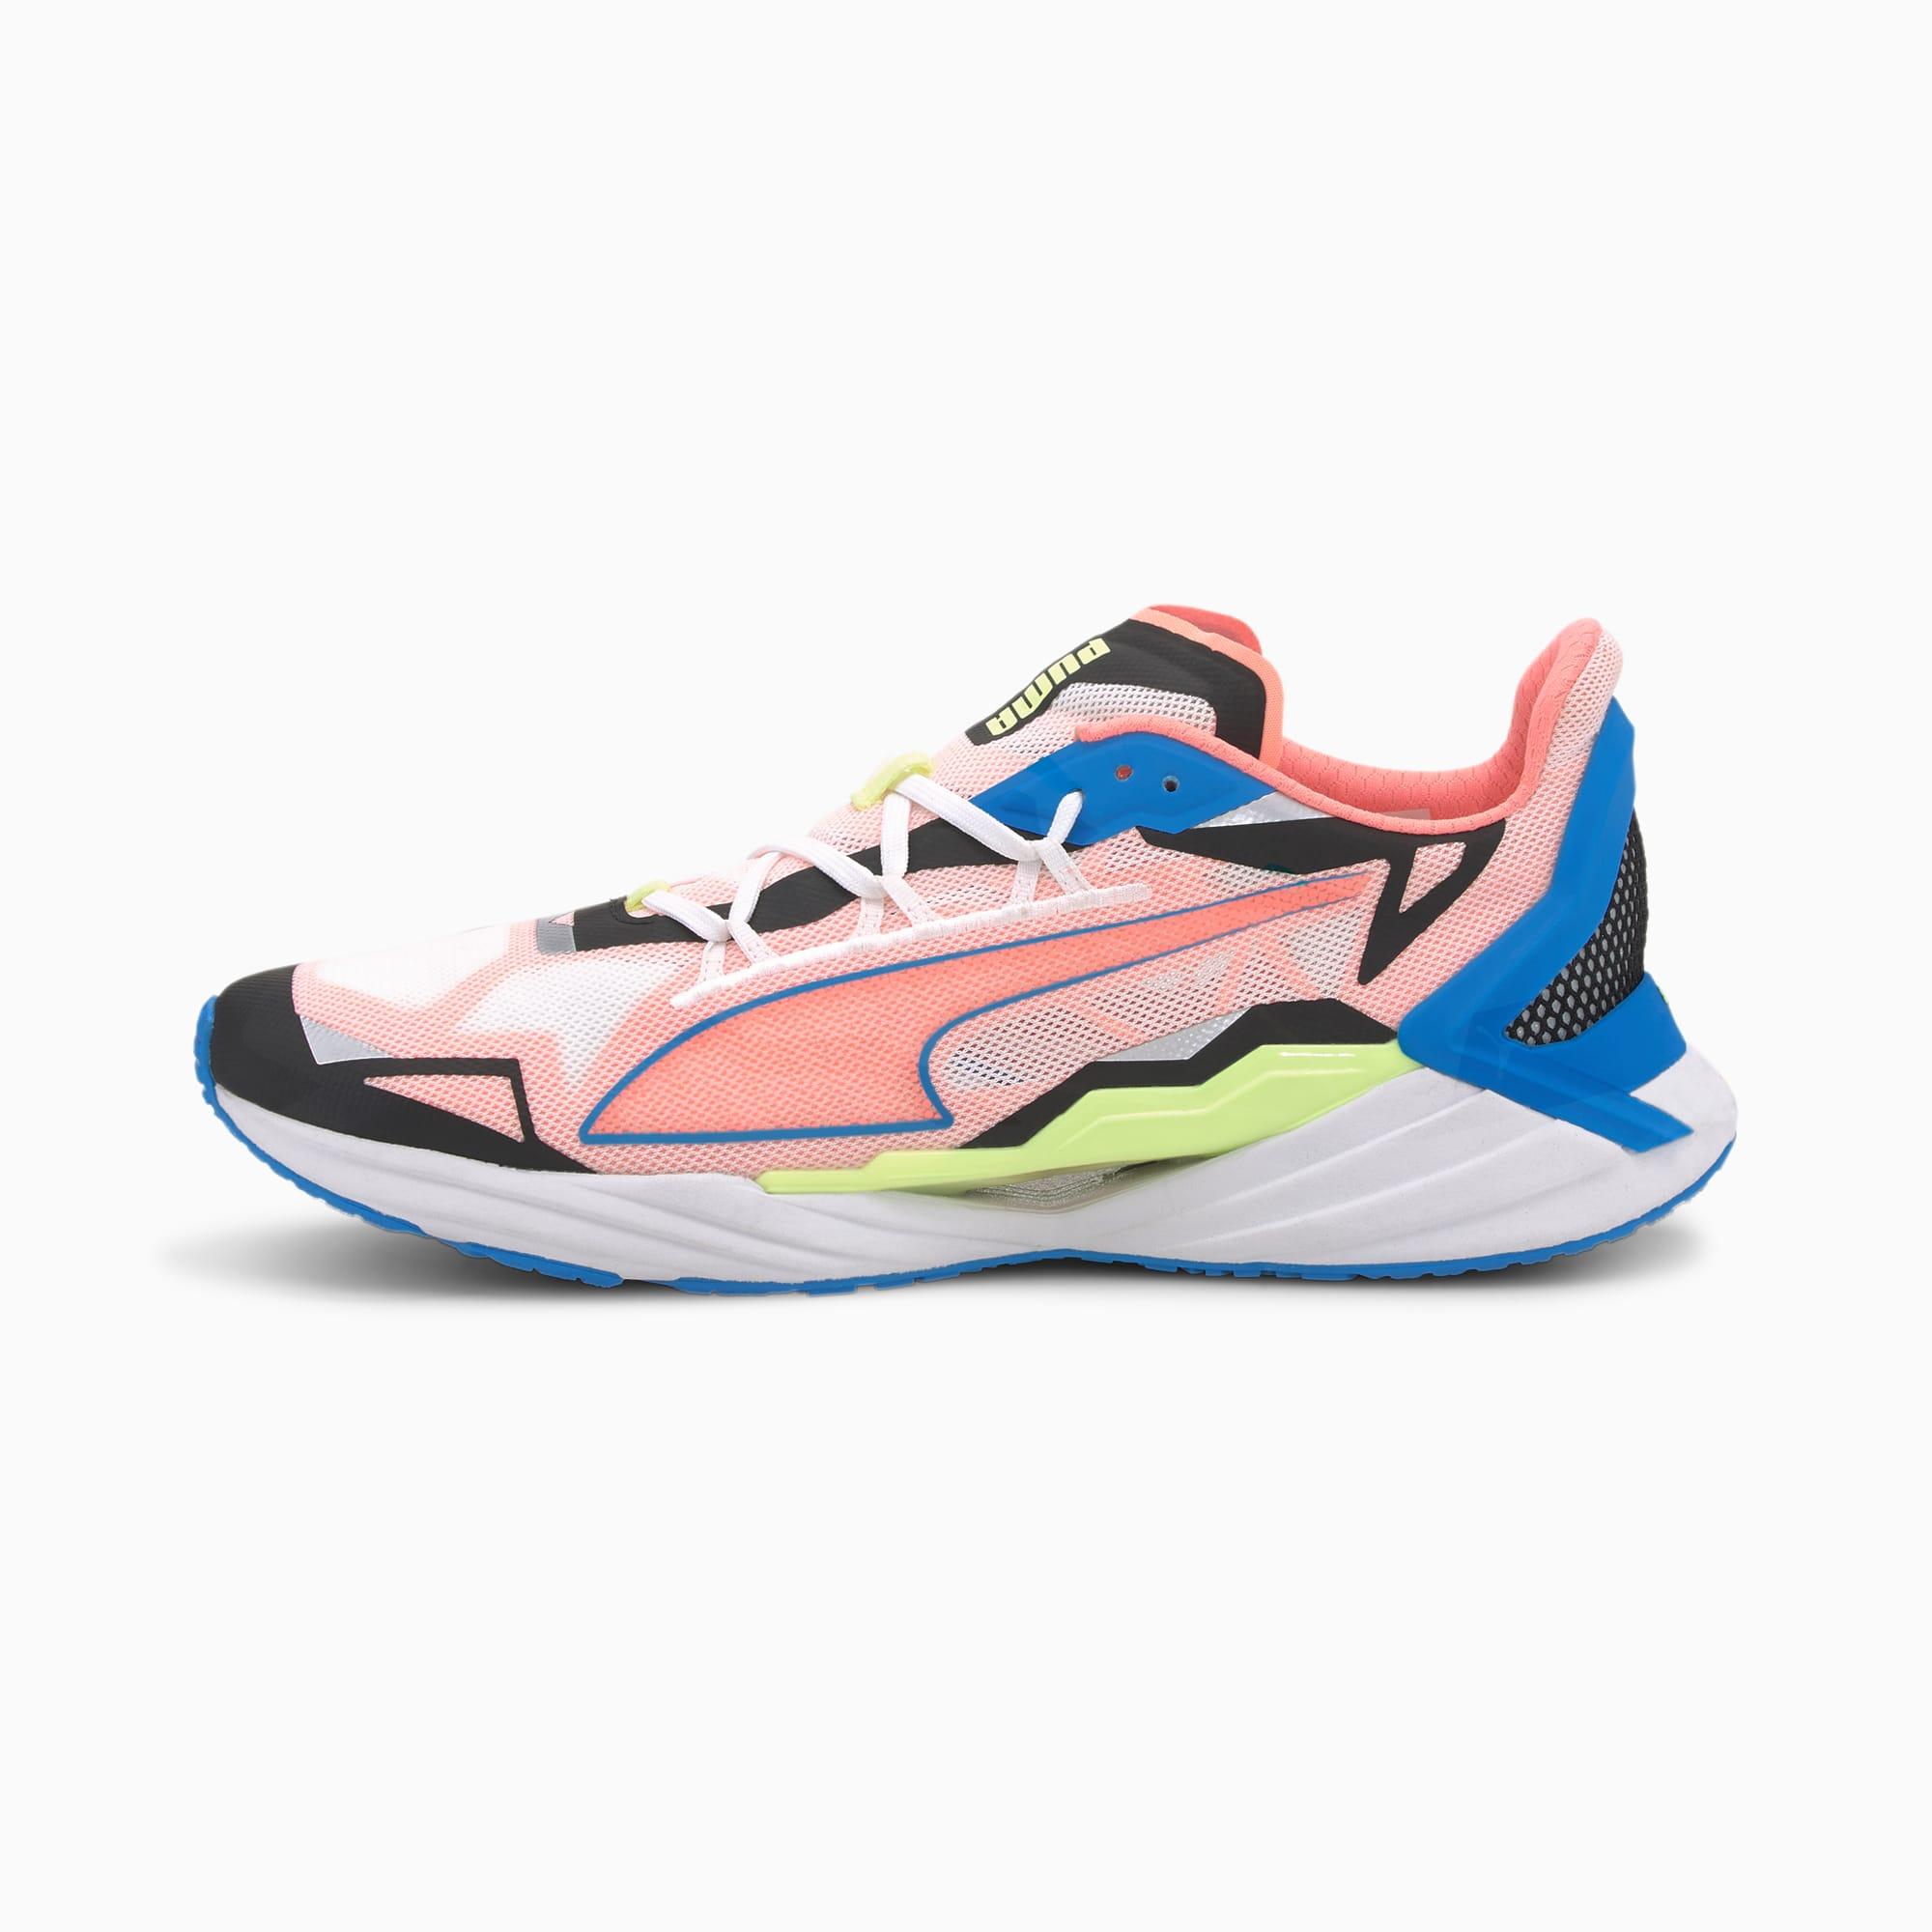 scarpe da running uomo puma